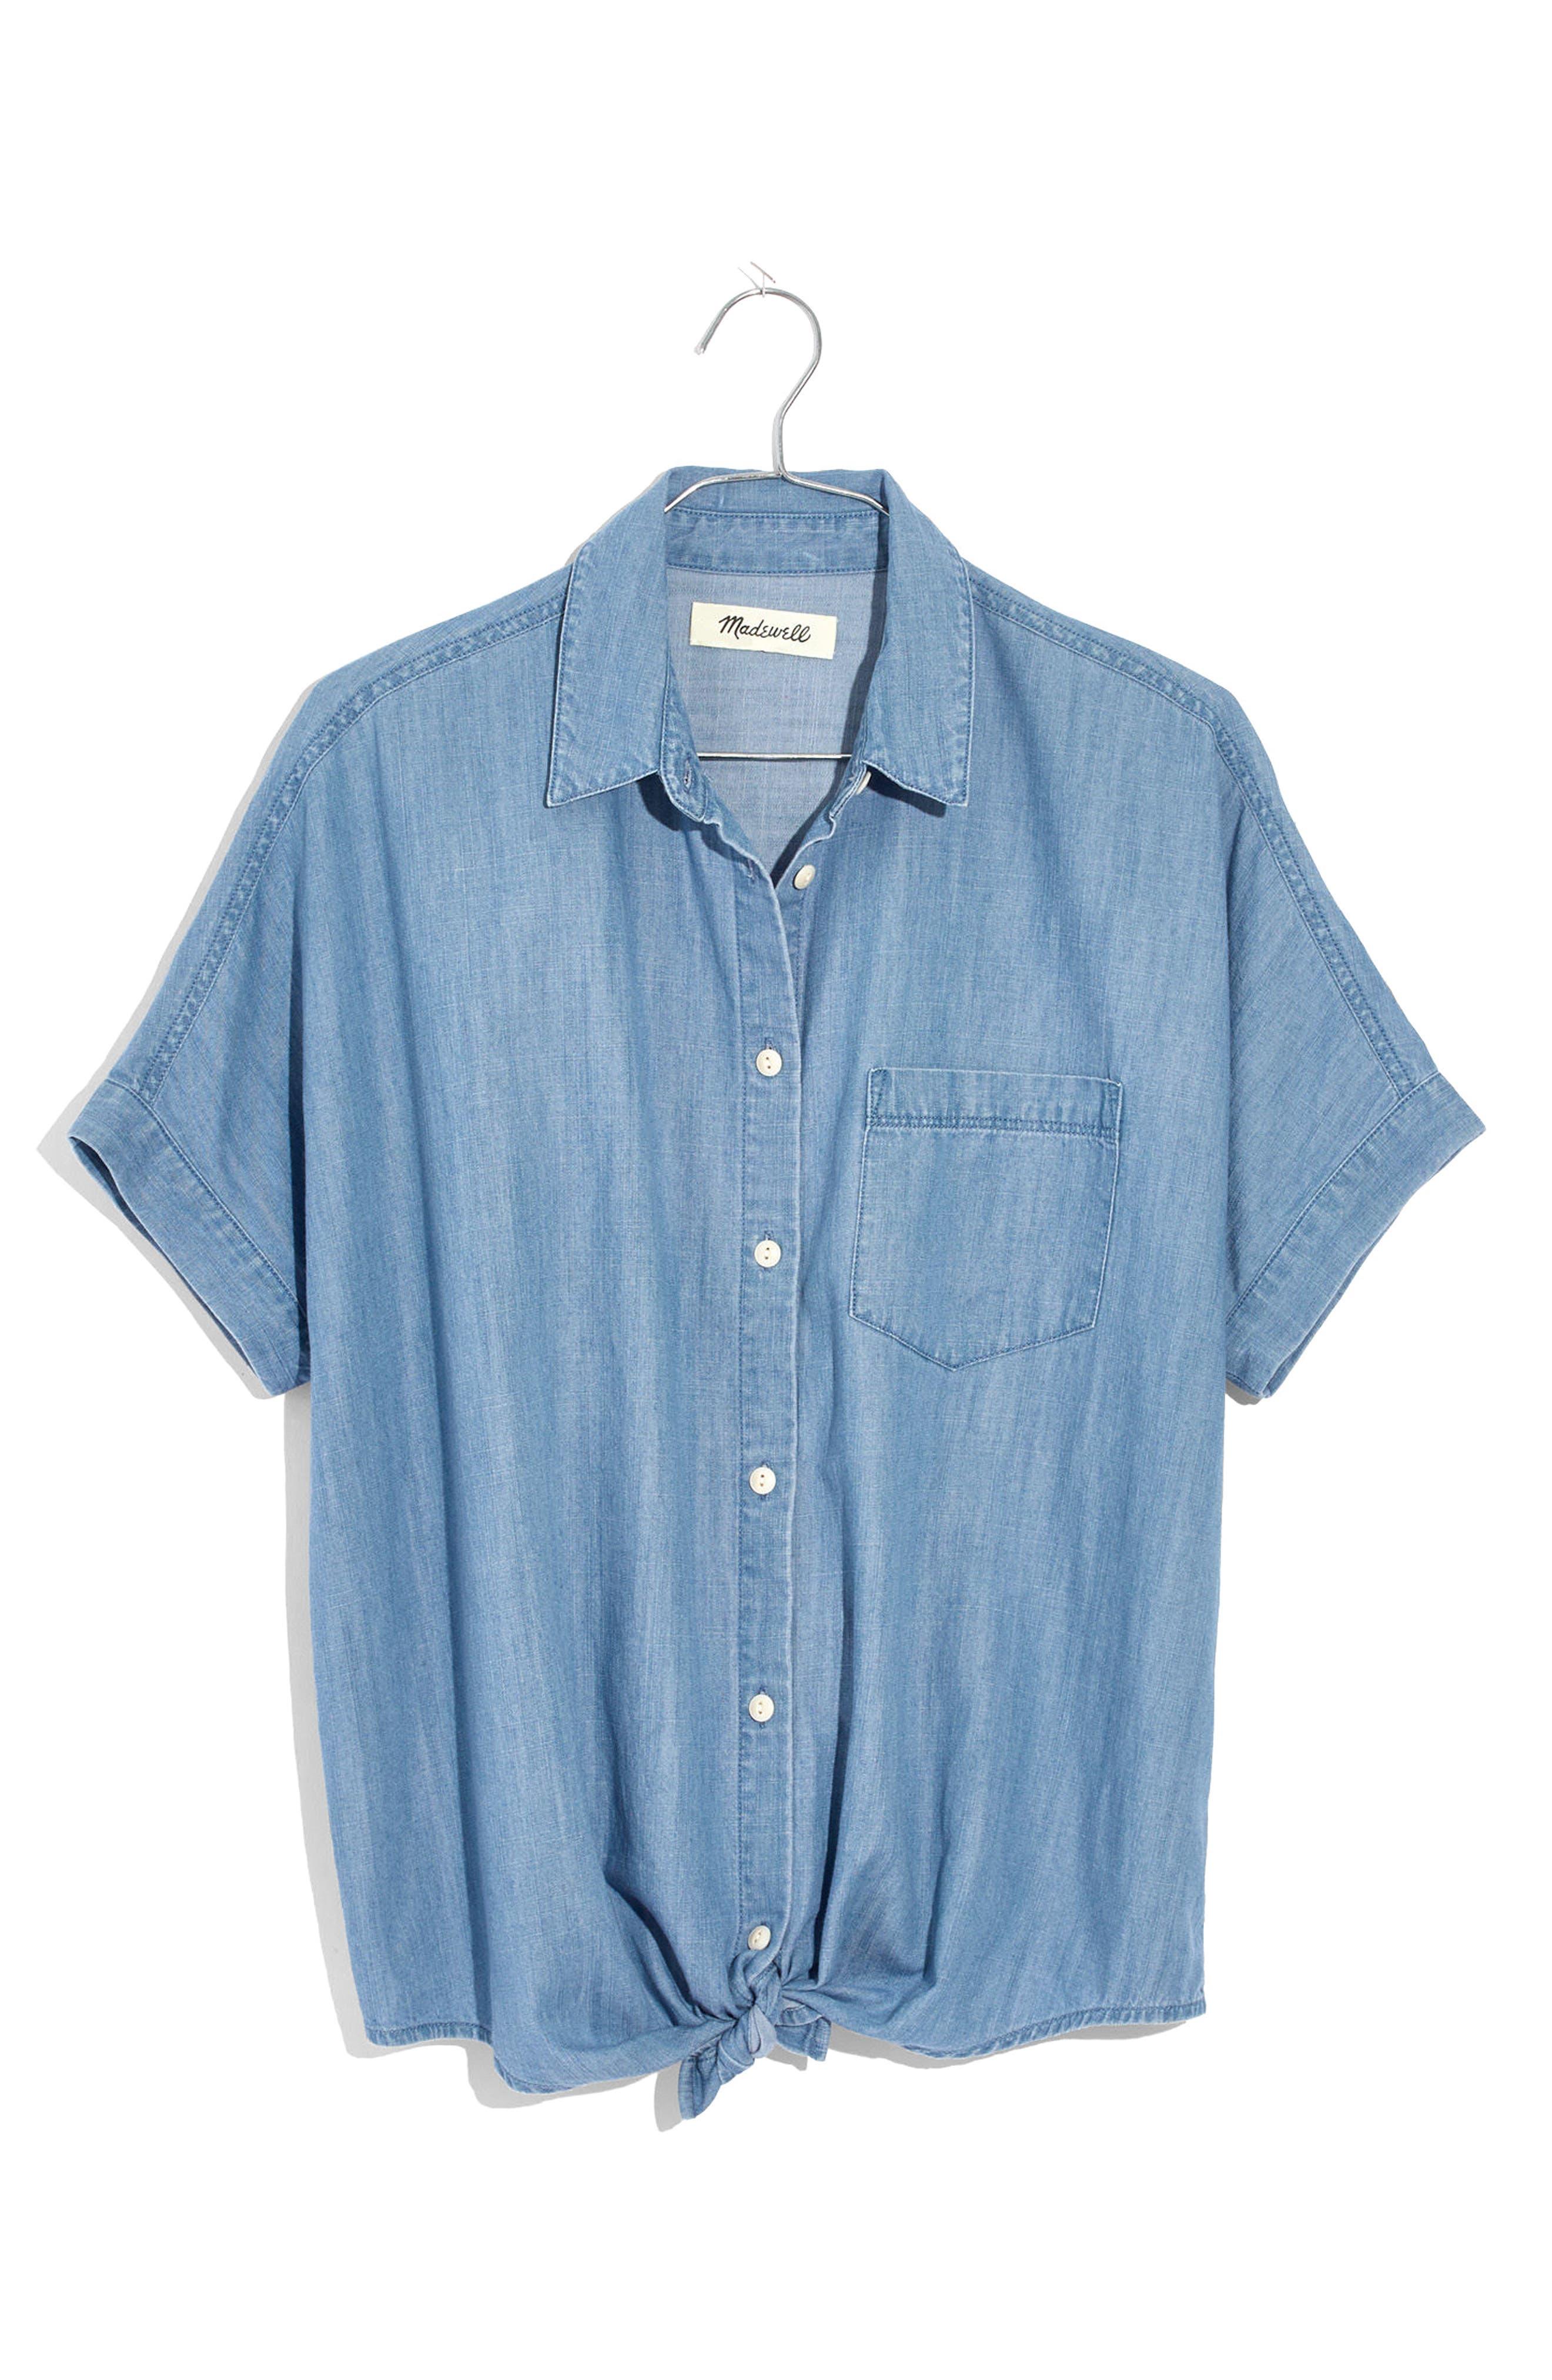 MADEWELL,                             Tie Front Short Sleeve Denim Shirt,                             Alternate thumbnail 4, color,                             400